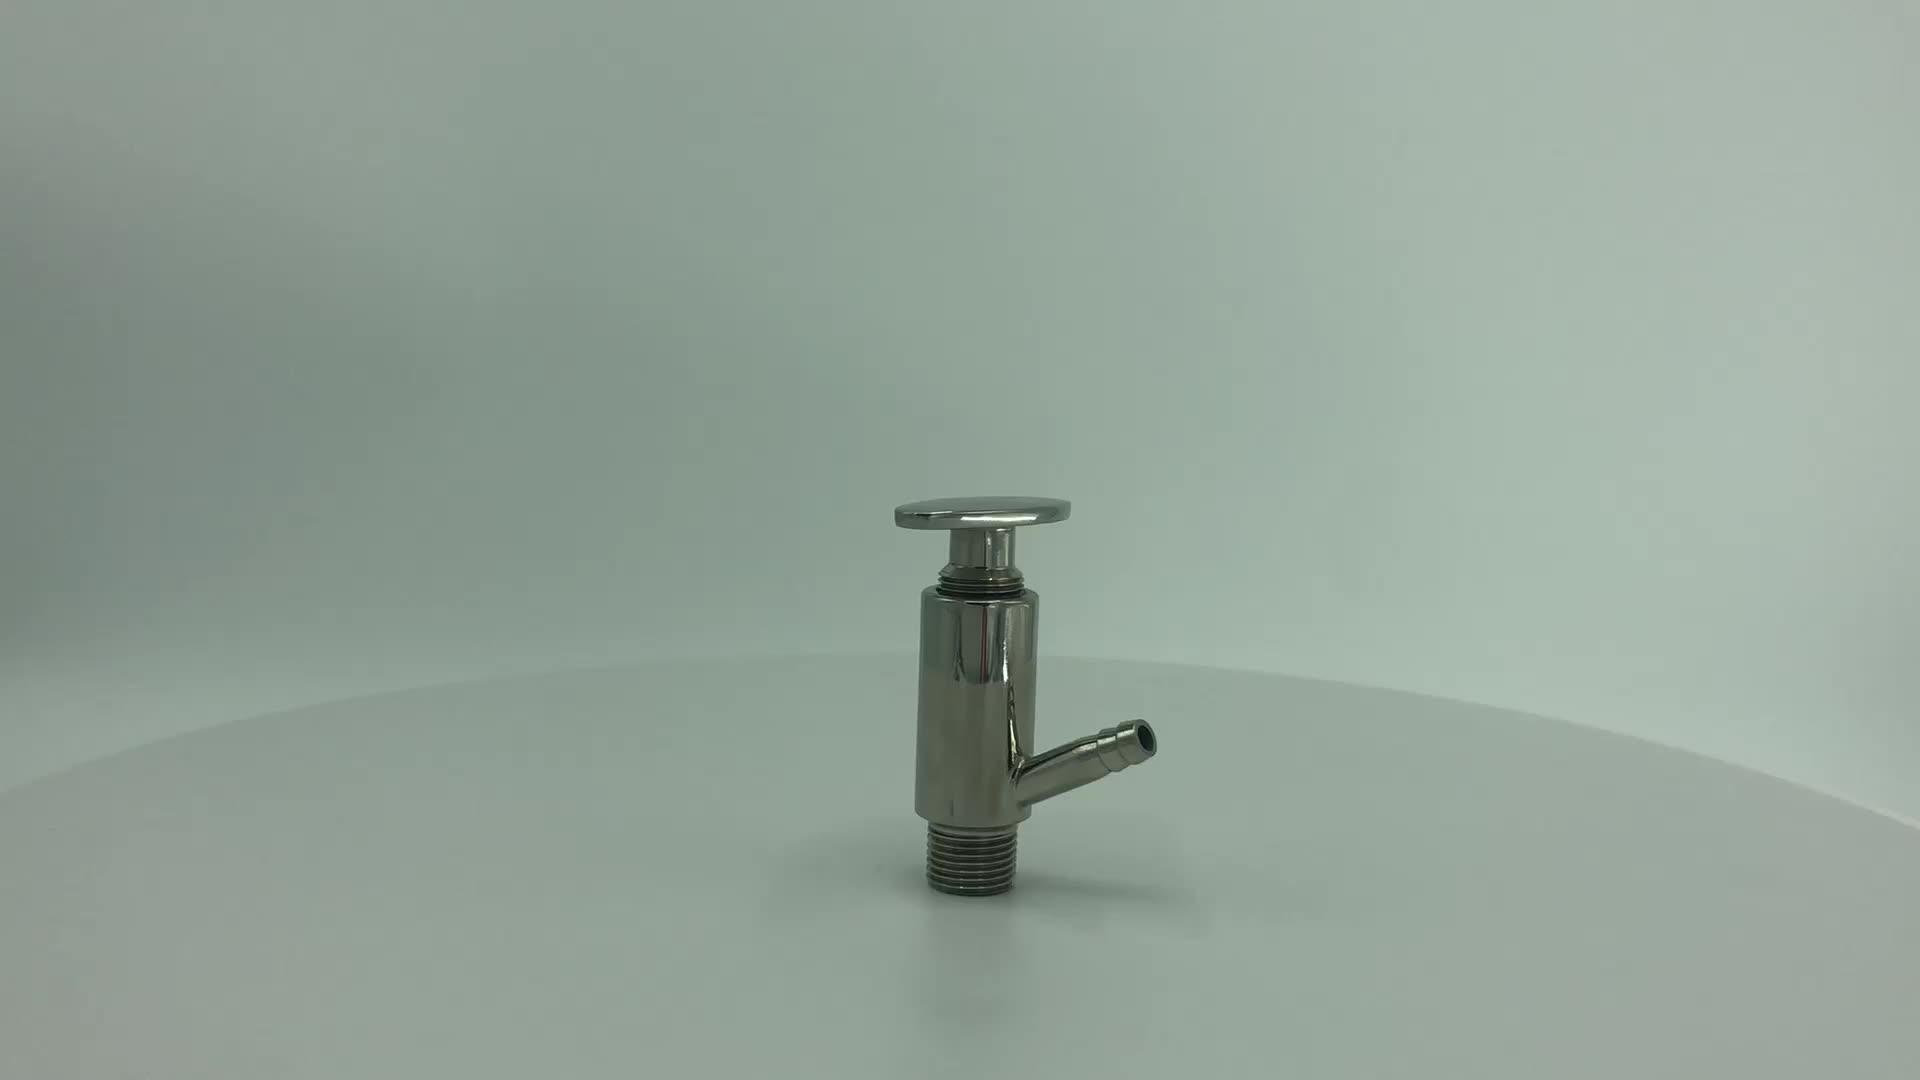 DONJOY Sanitary stainless steel clamp sample valve sanitary sampling valve